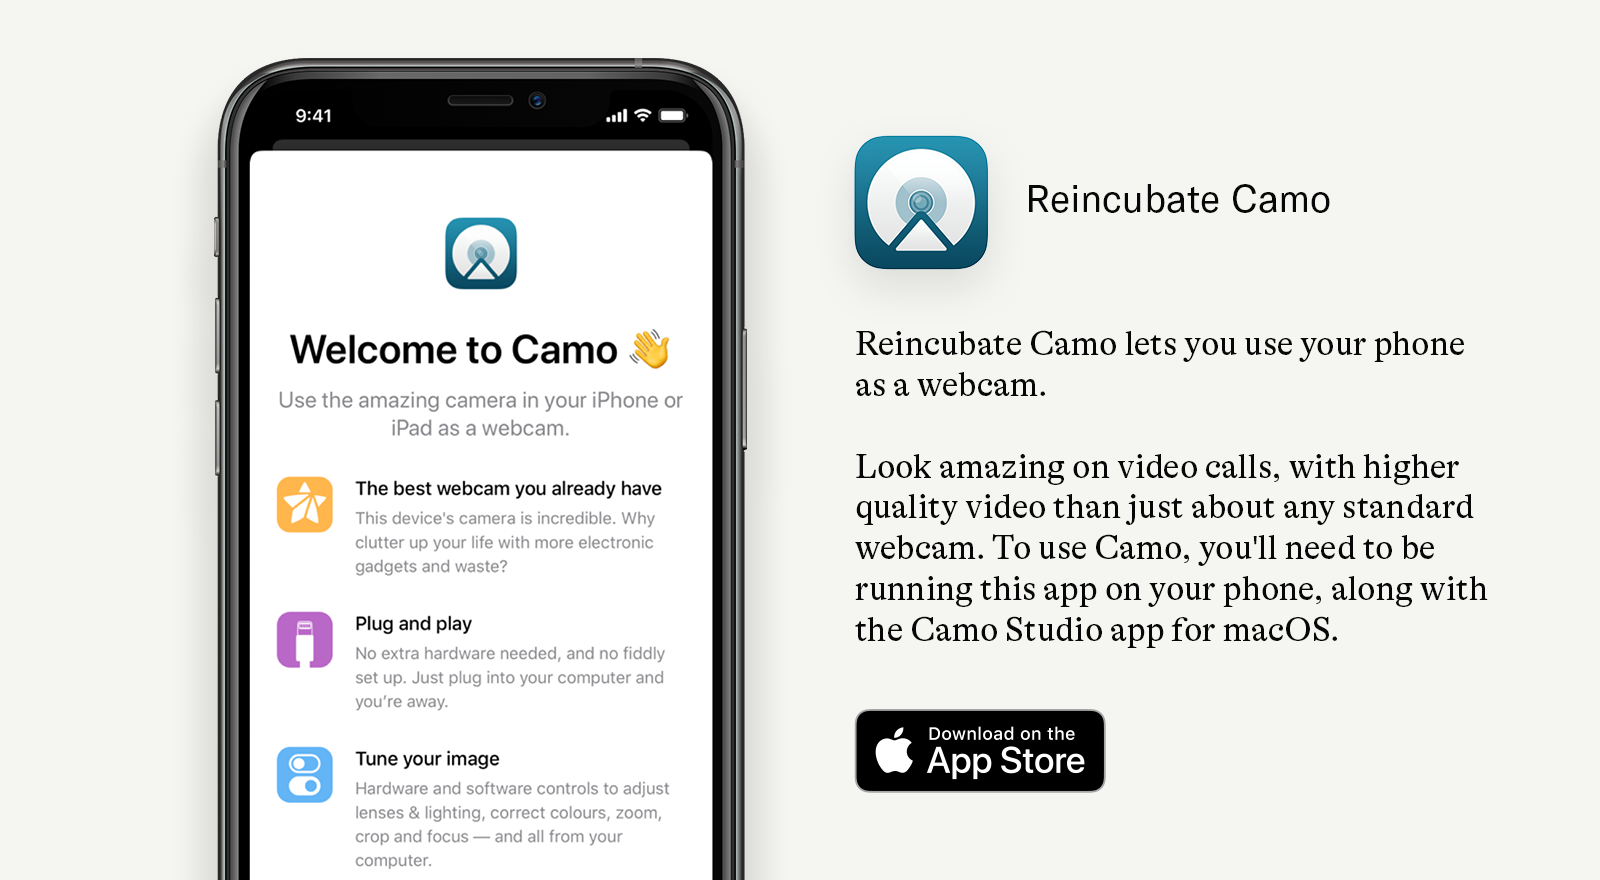 Reincubate Camo App icon